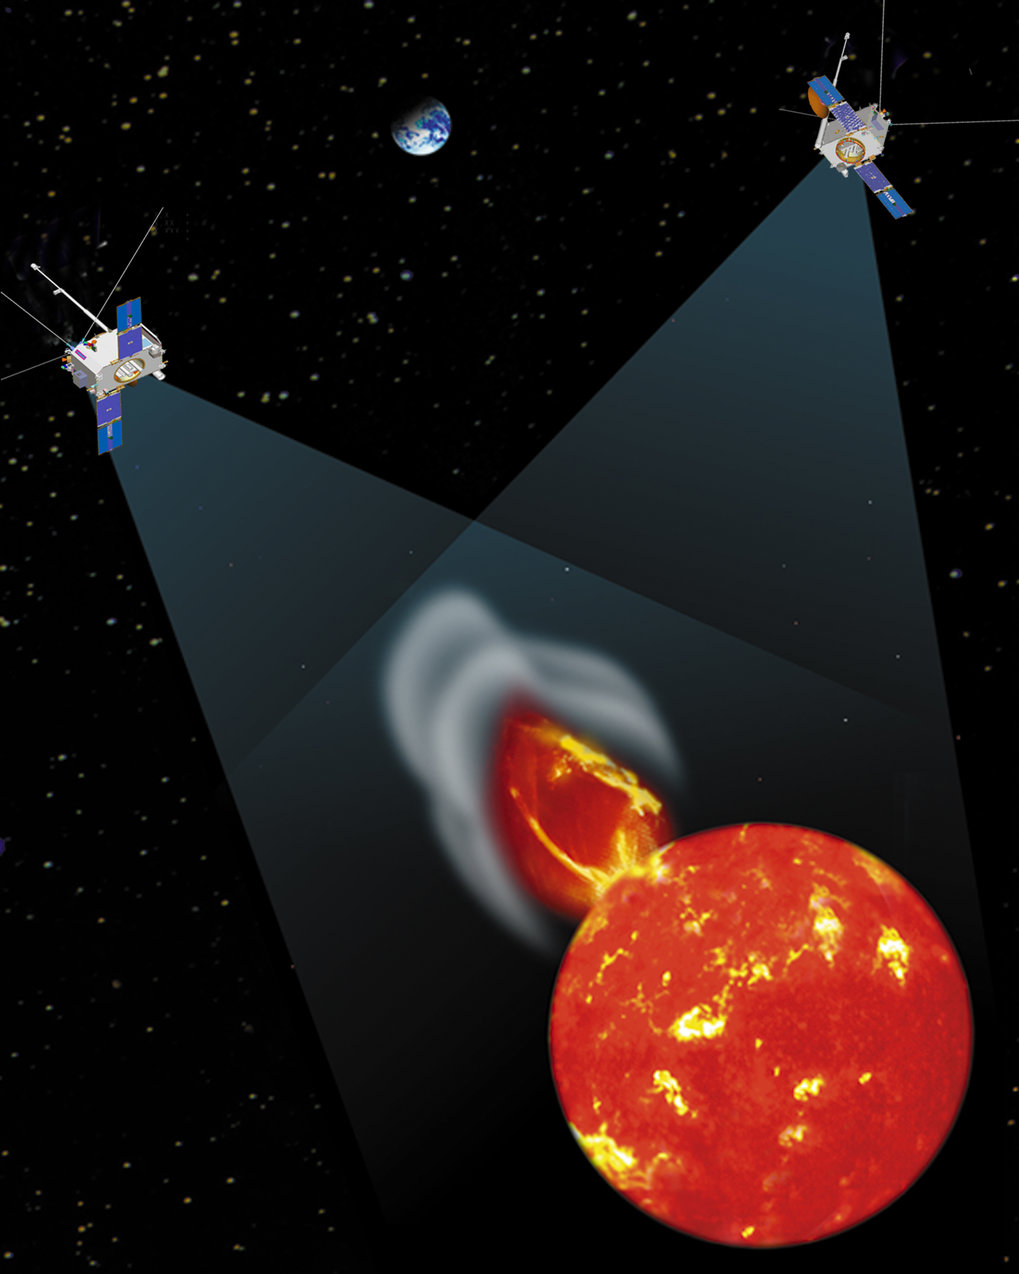 STEREO-близнецы покажут землянам невидимое Солнце.